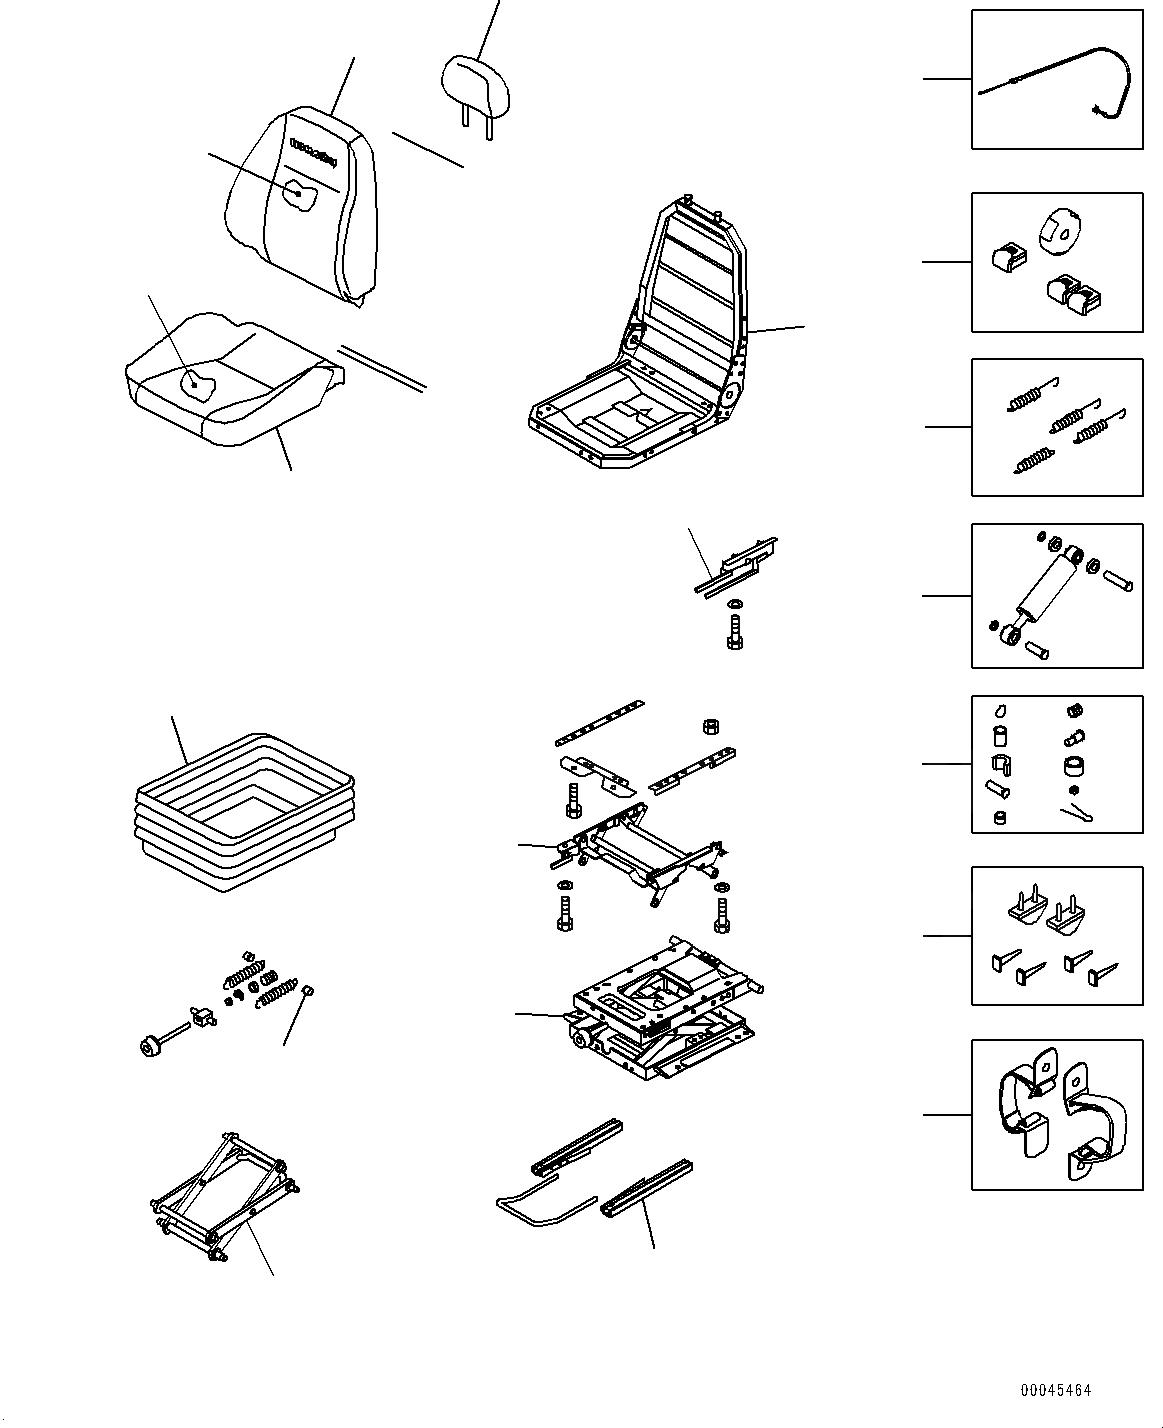 20Y-57-41104 Komatsu ПОСАДКА